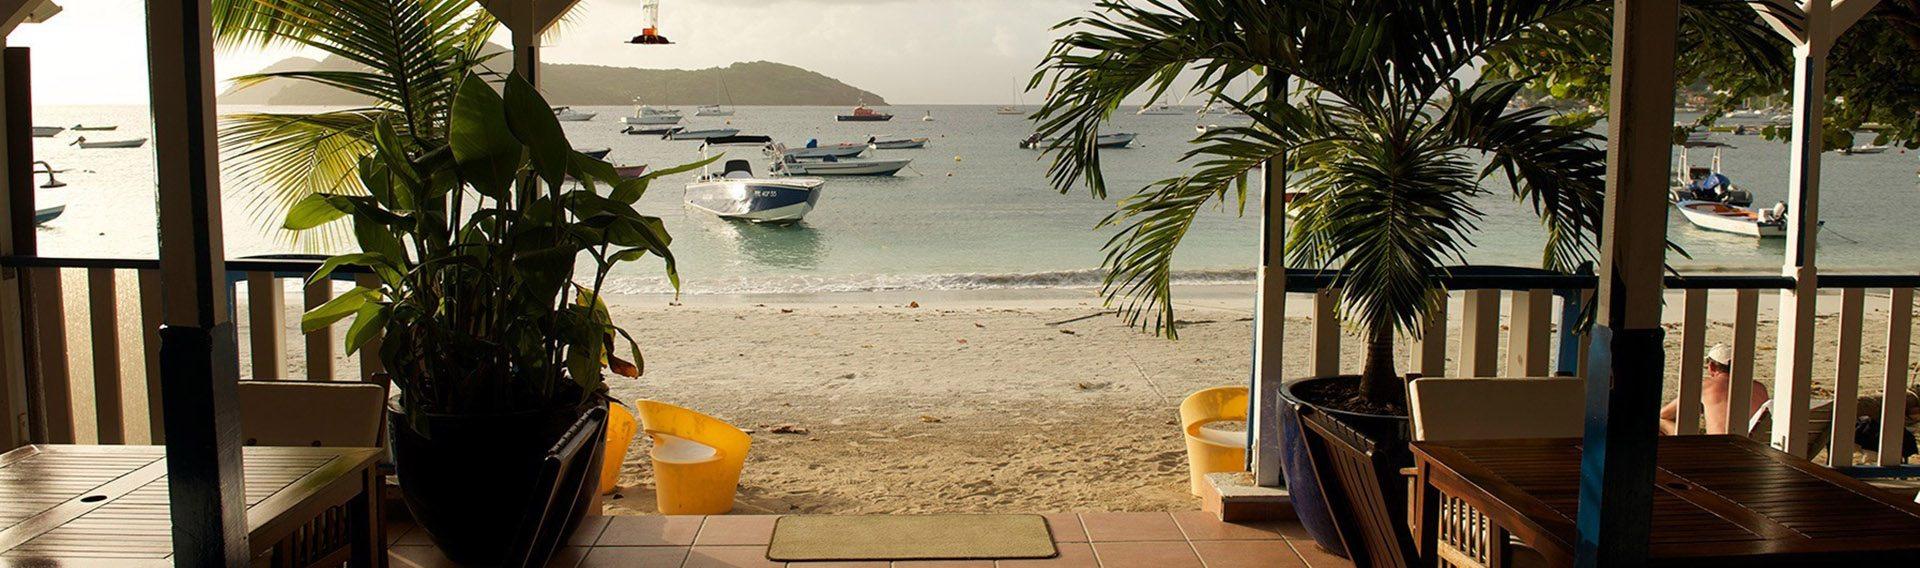 Lo Bleu Hotel Guadeloupe Islands